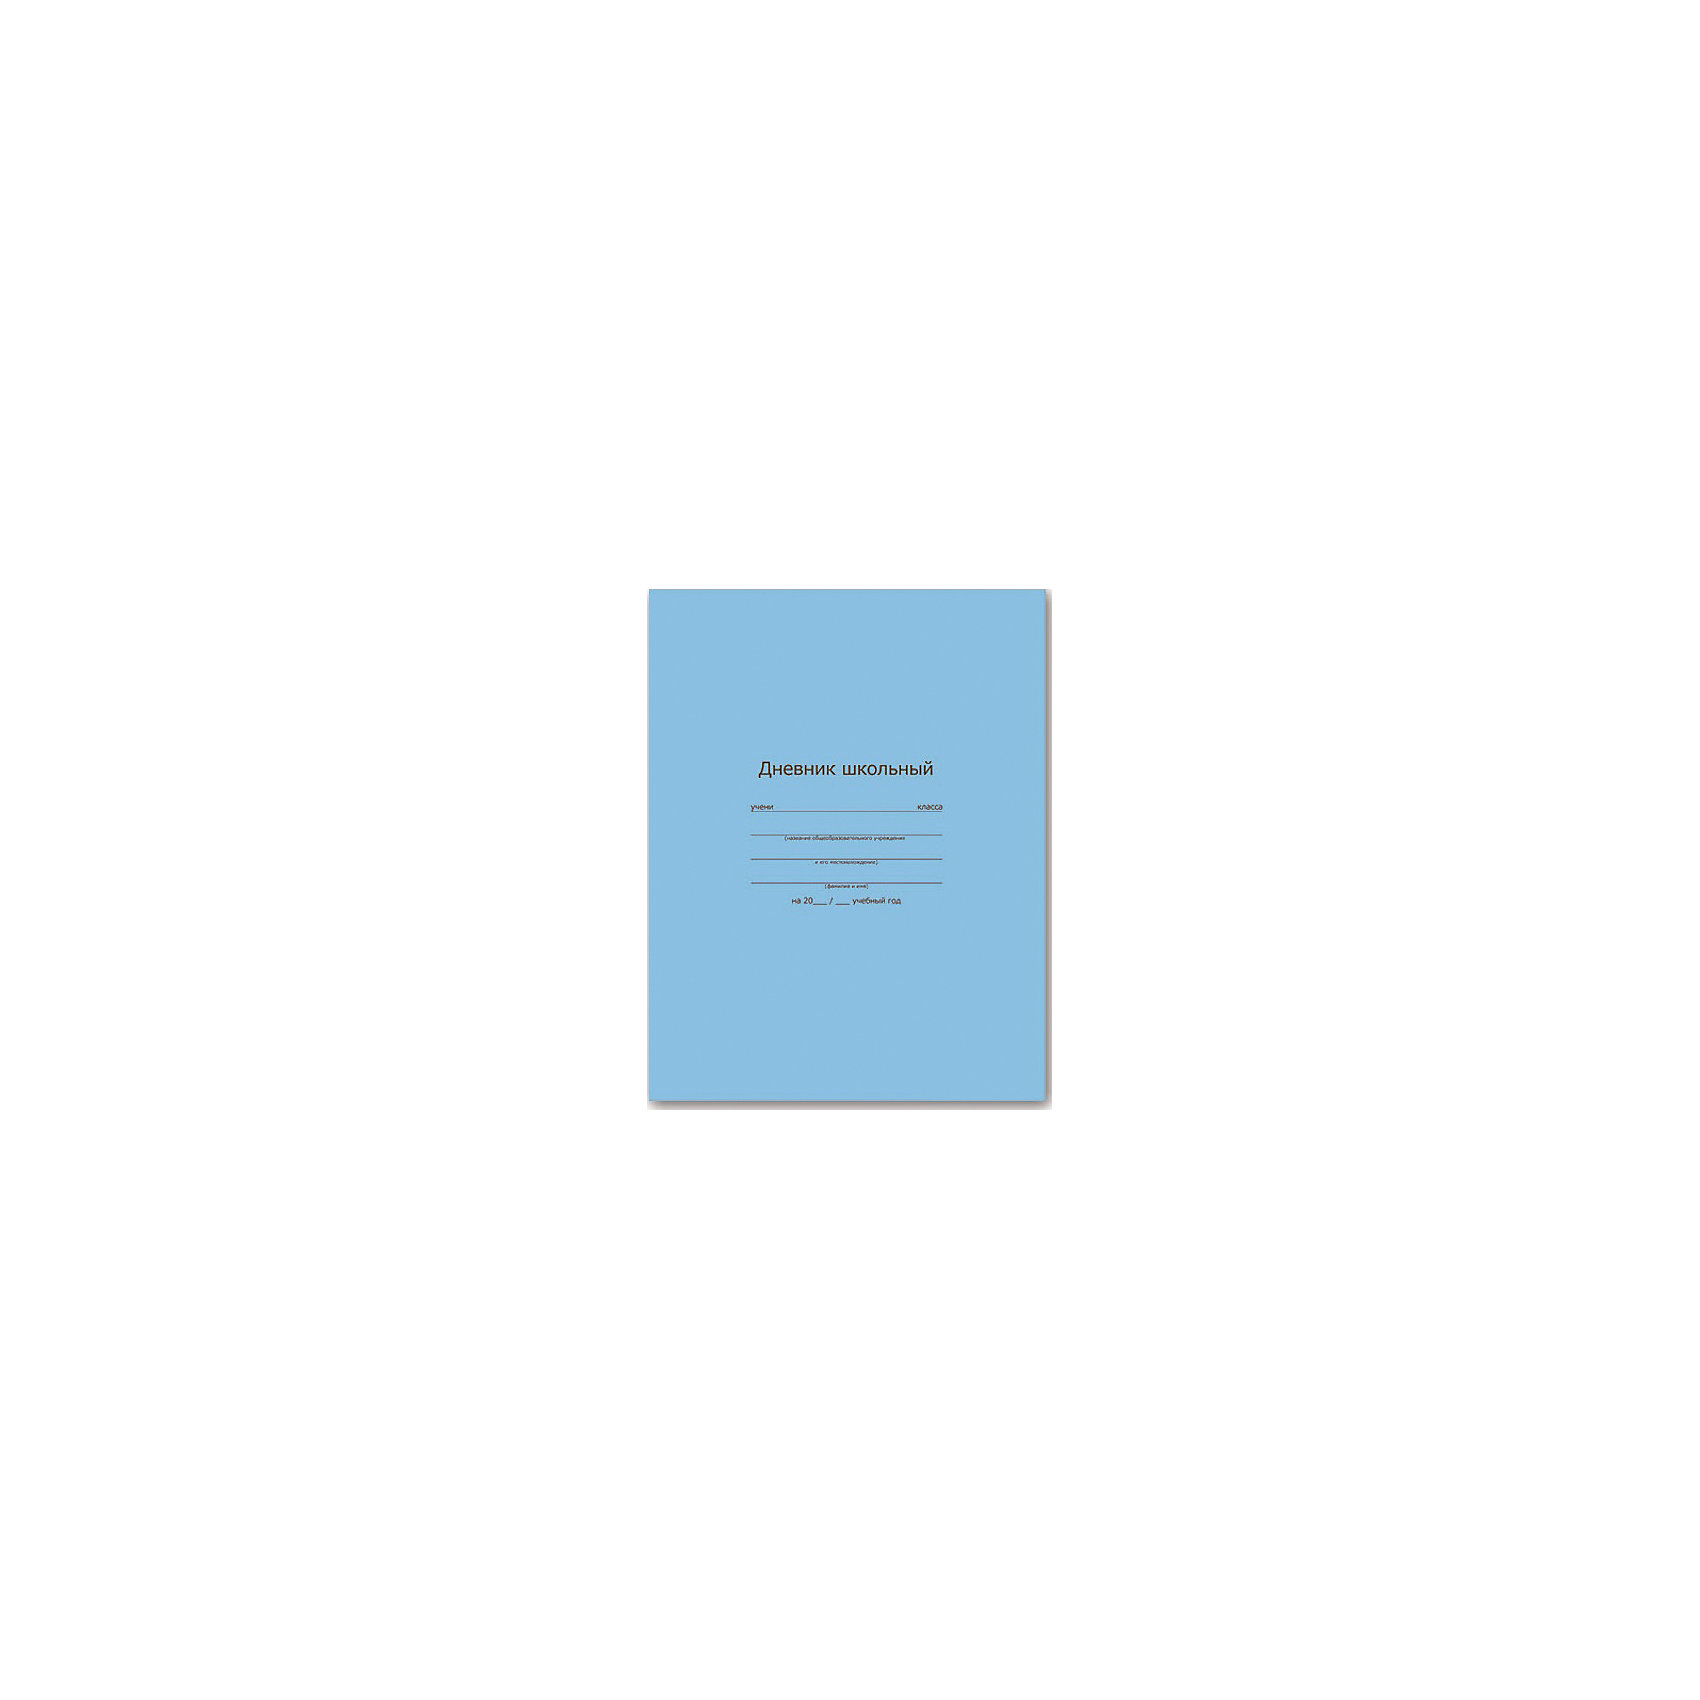 Феникс+ Дневник, голубой д васабова дневник алматинки